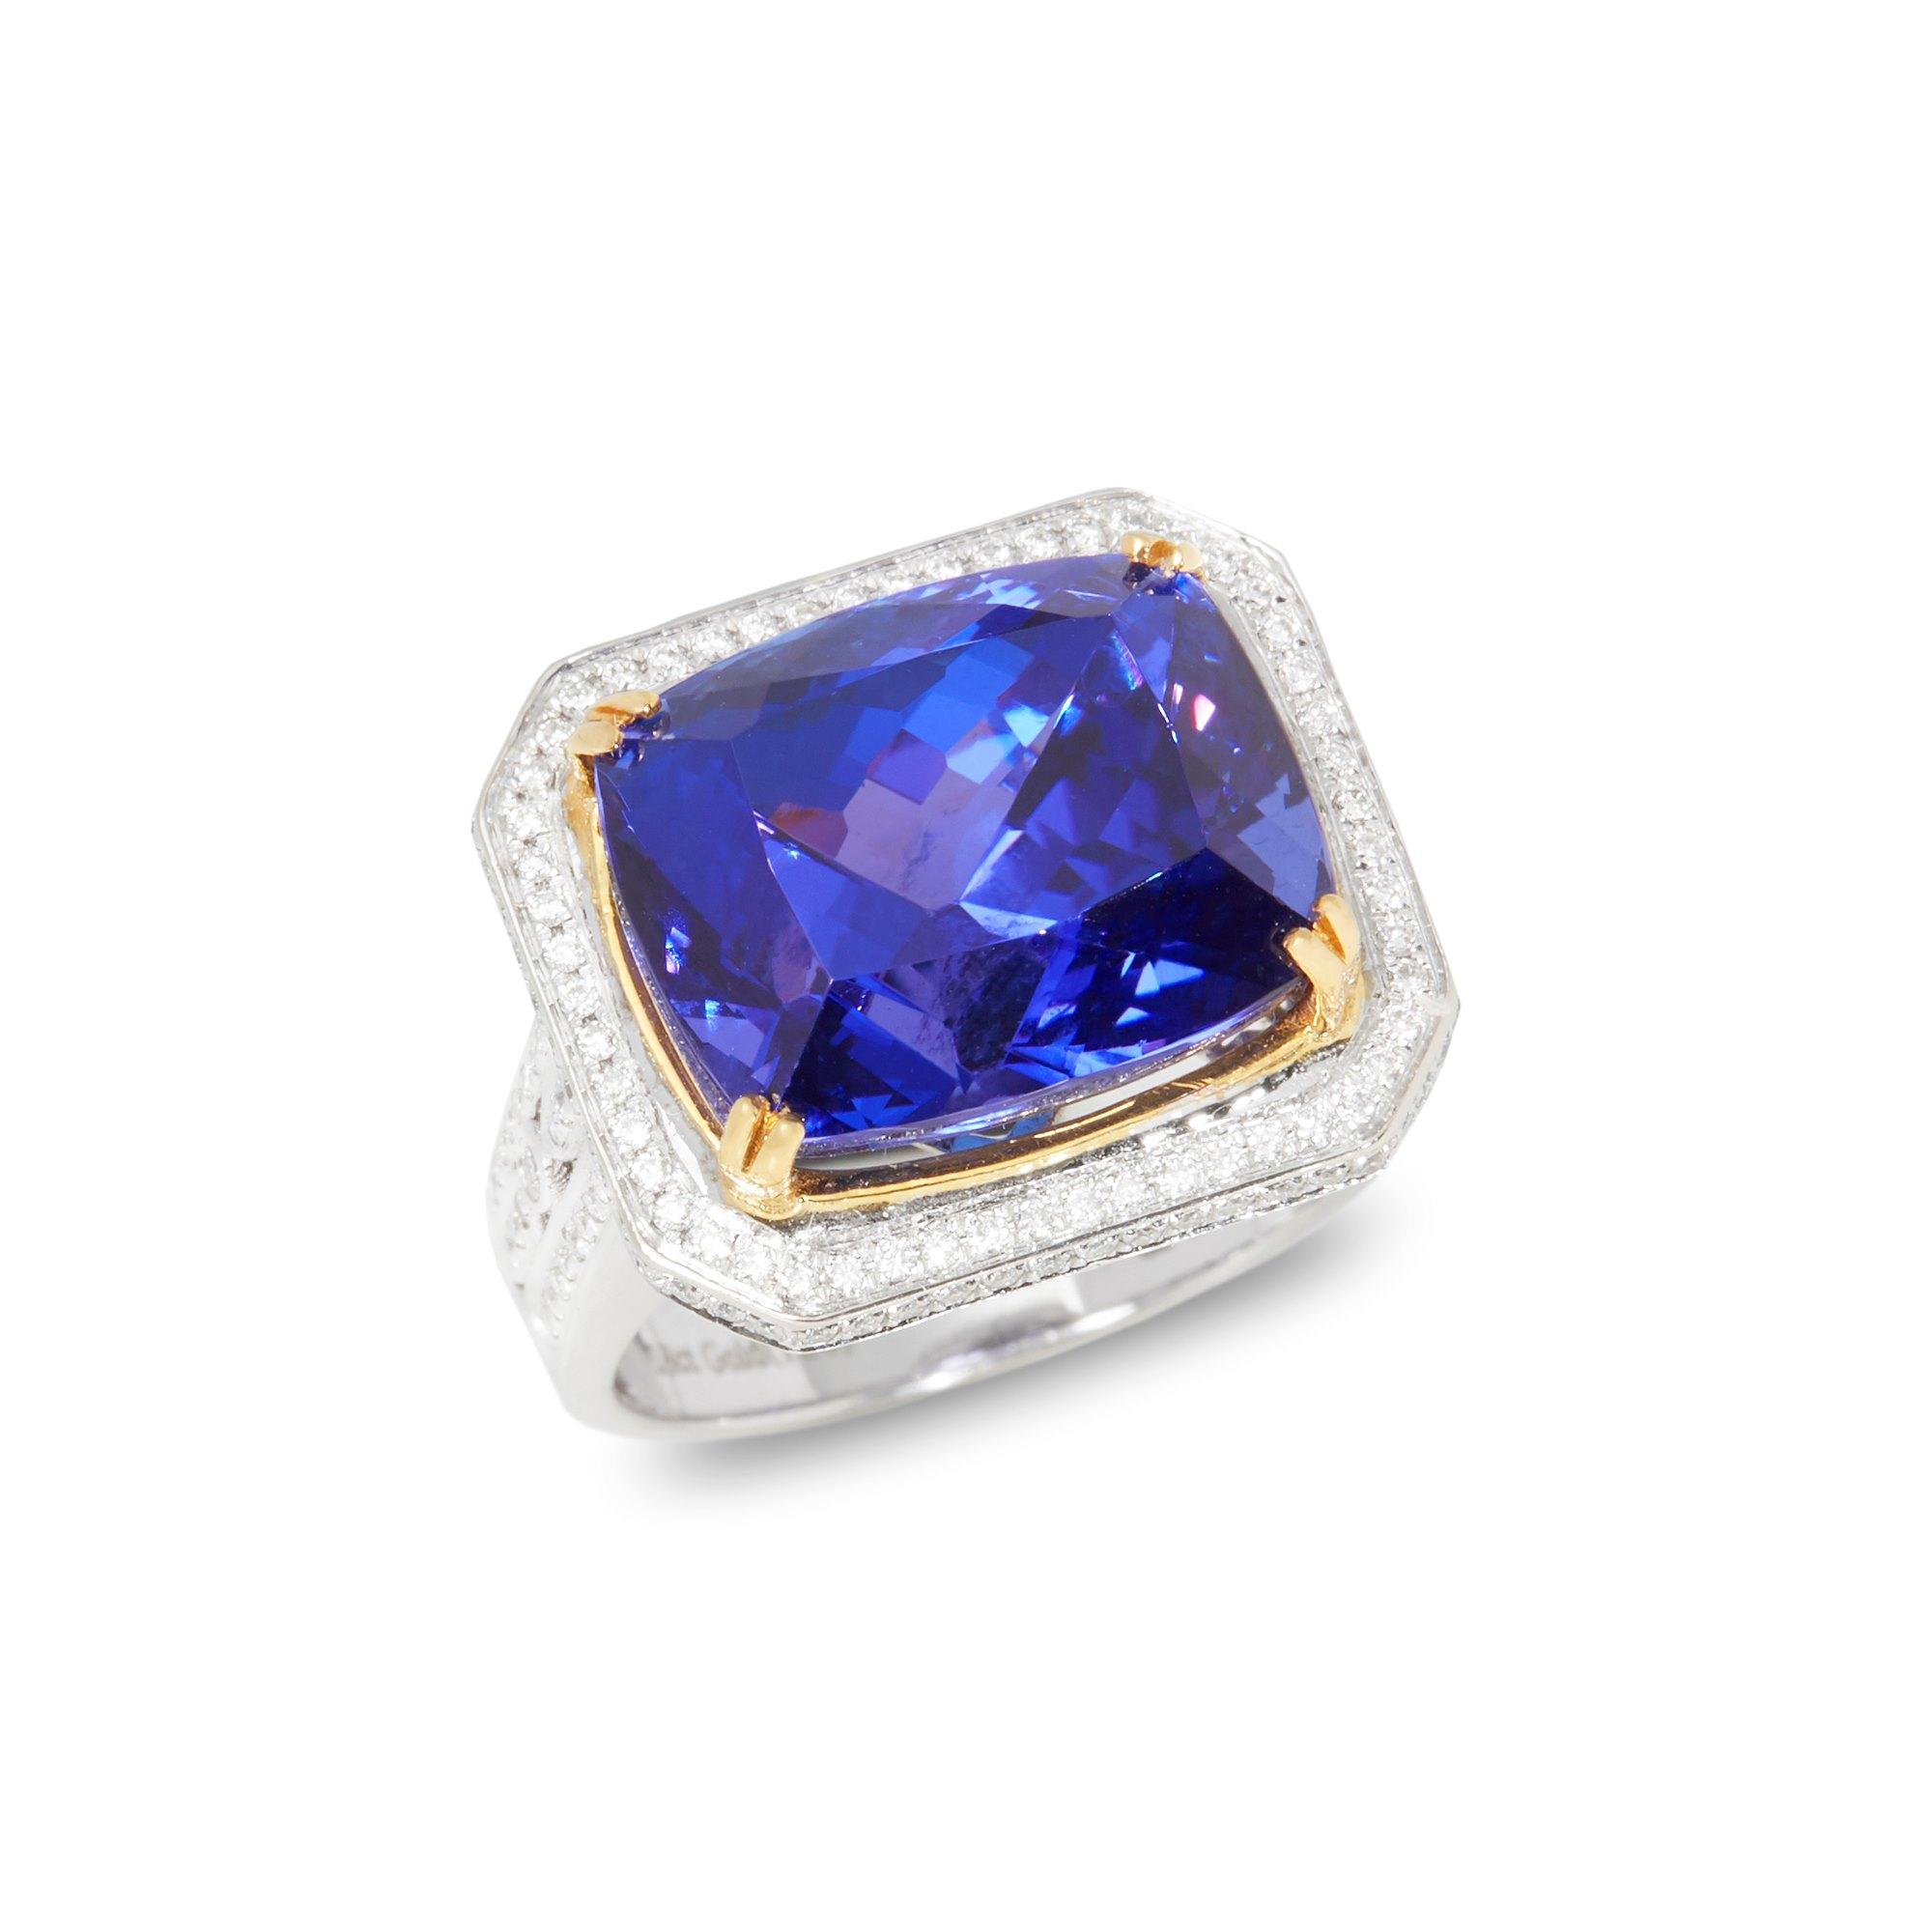 David Jerome Certified 15.2ct Cushion Cut Tanzanite and Diamond 18ct gold Ring